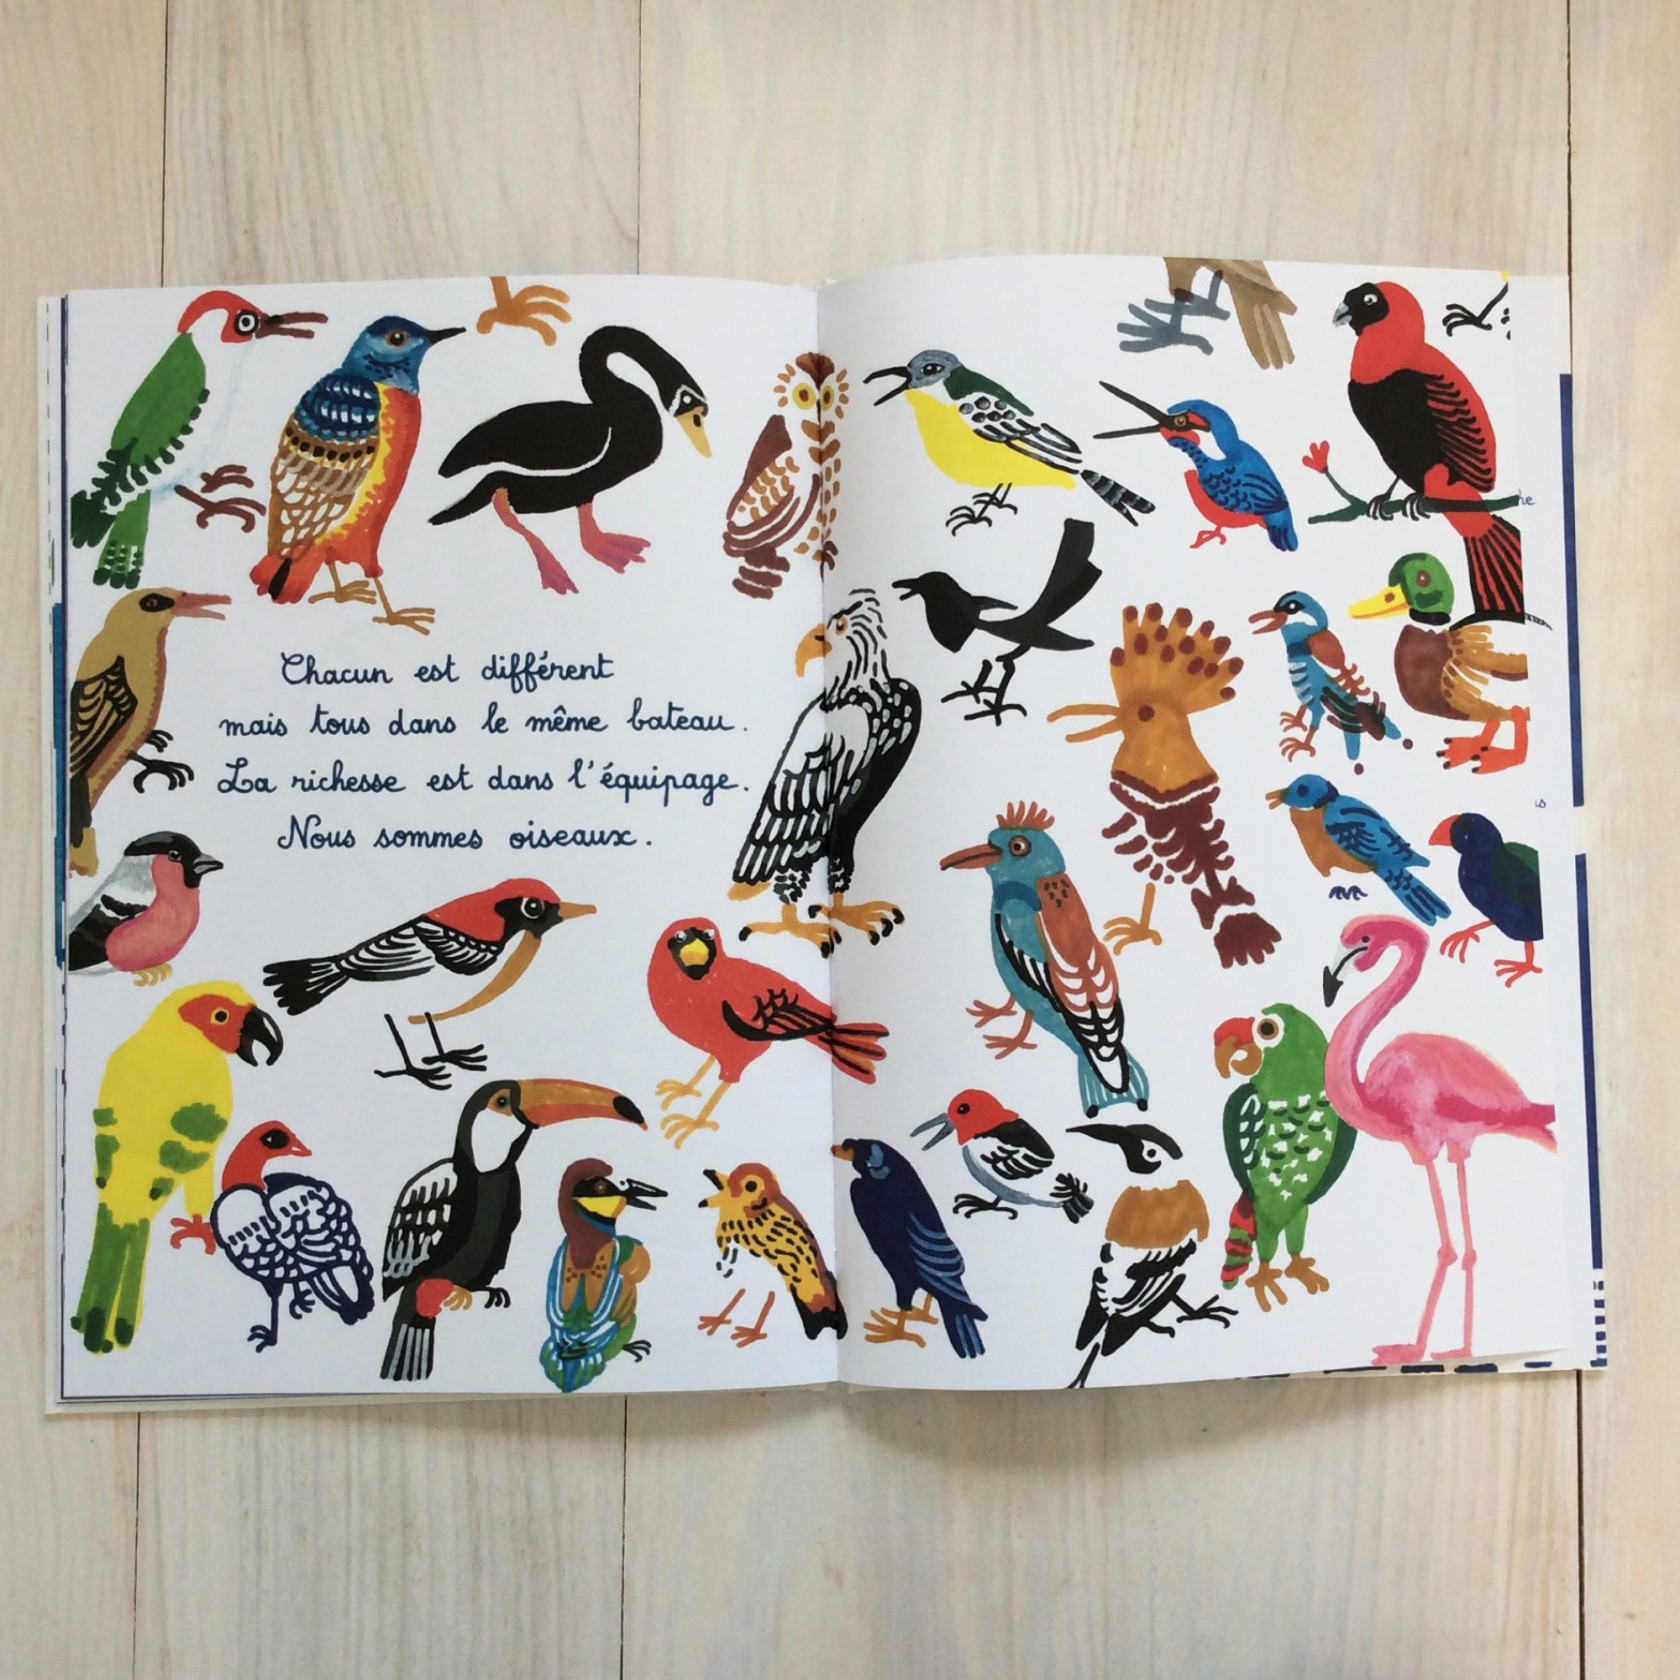 fouinzanardi -  fz_print.books_lesfourmsirouges12